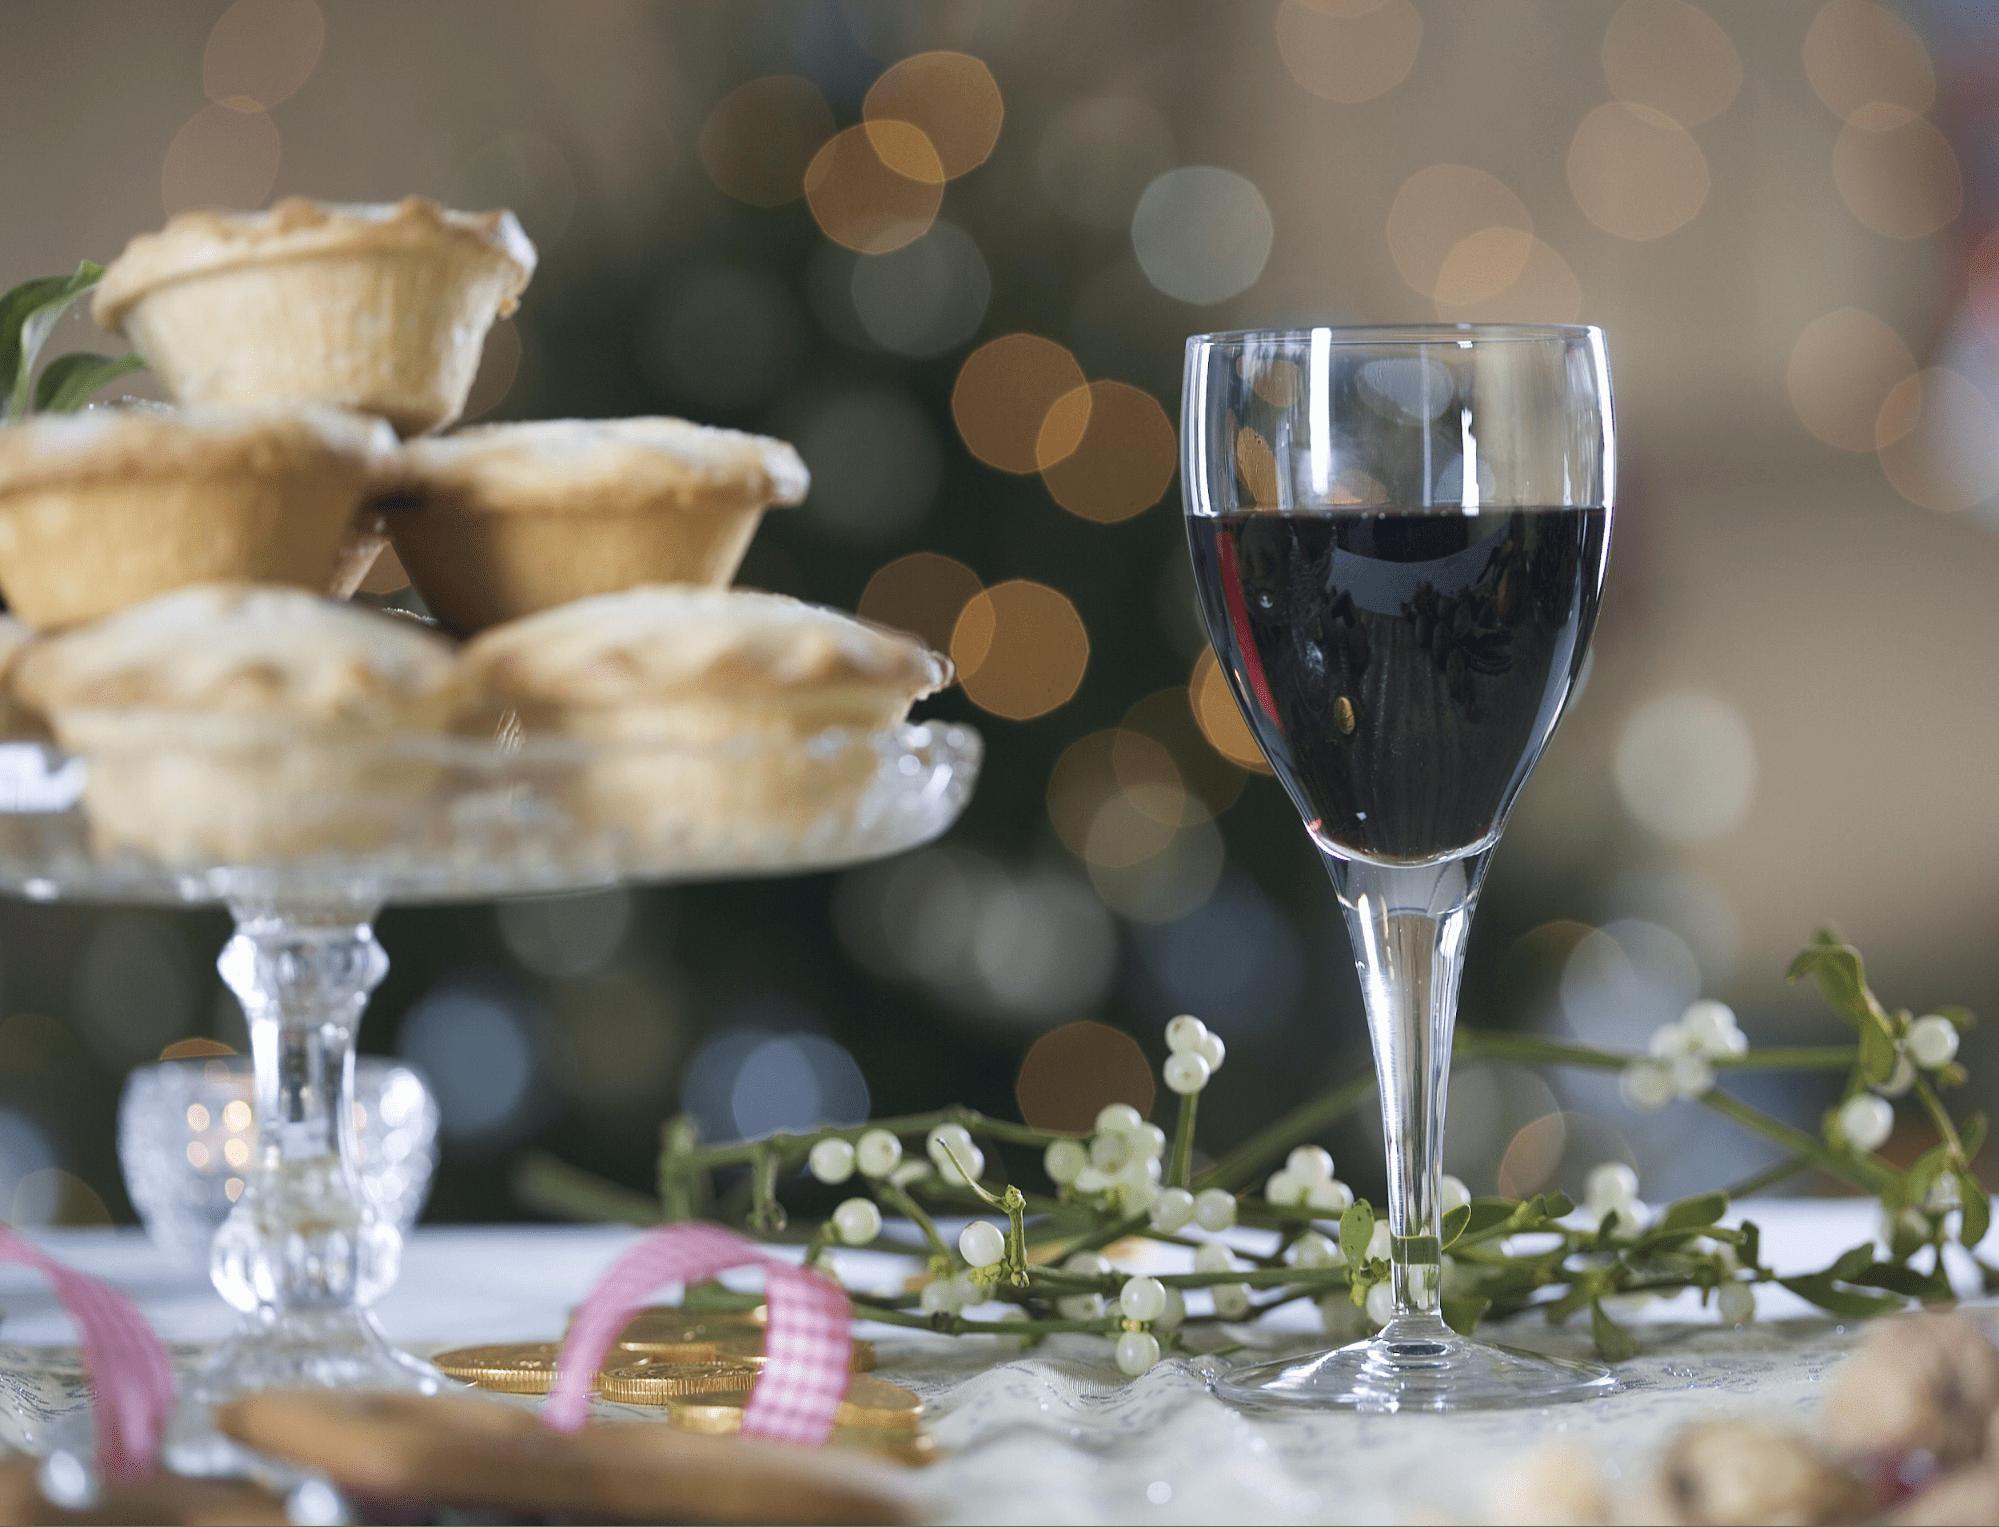 Wine and dessert - festive Christmas food pairing